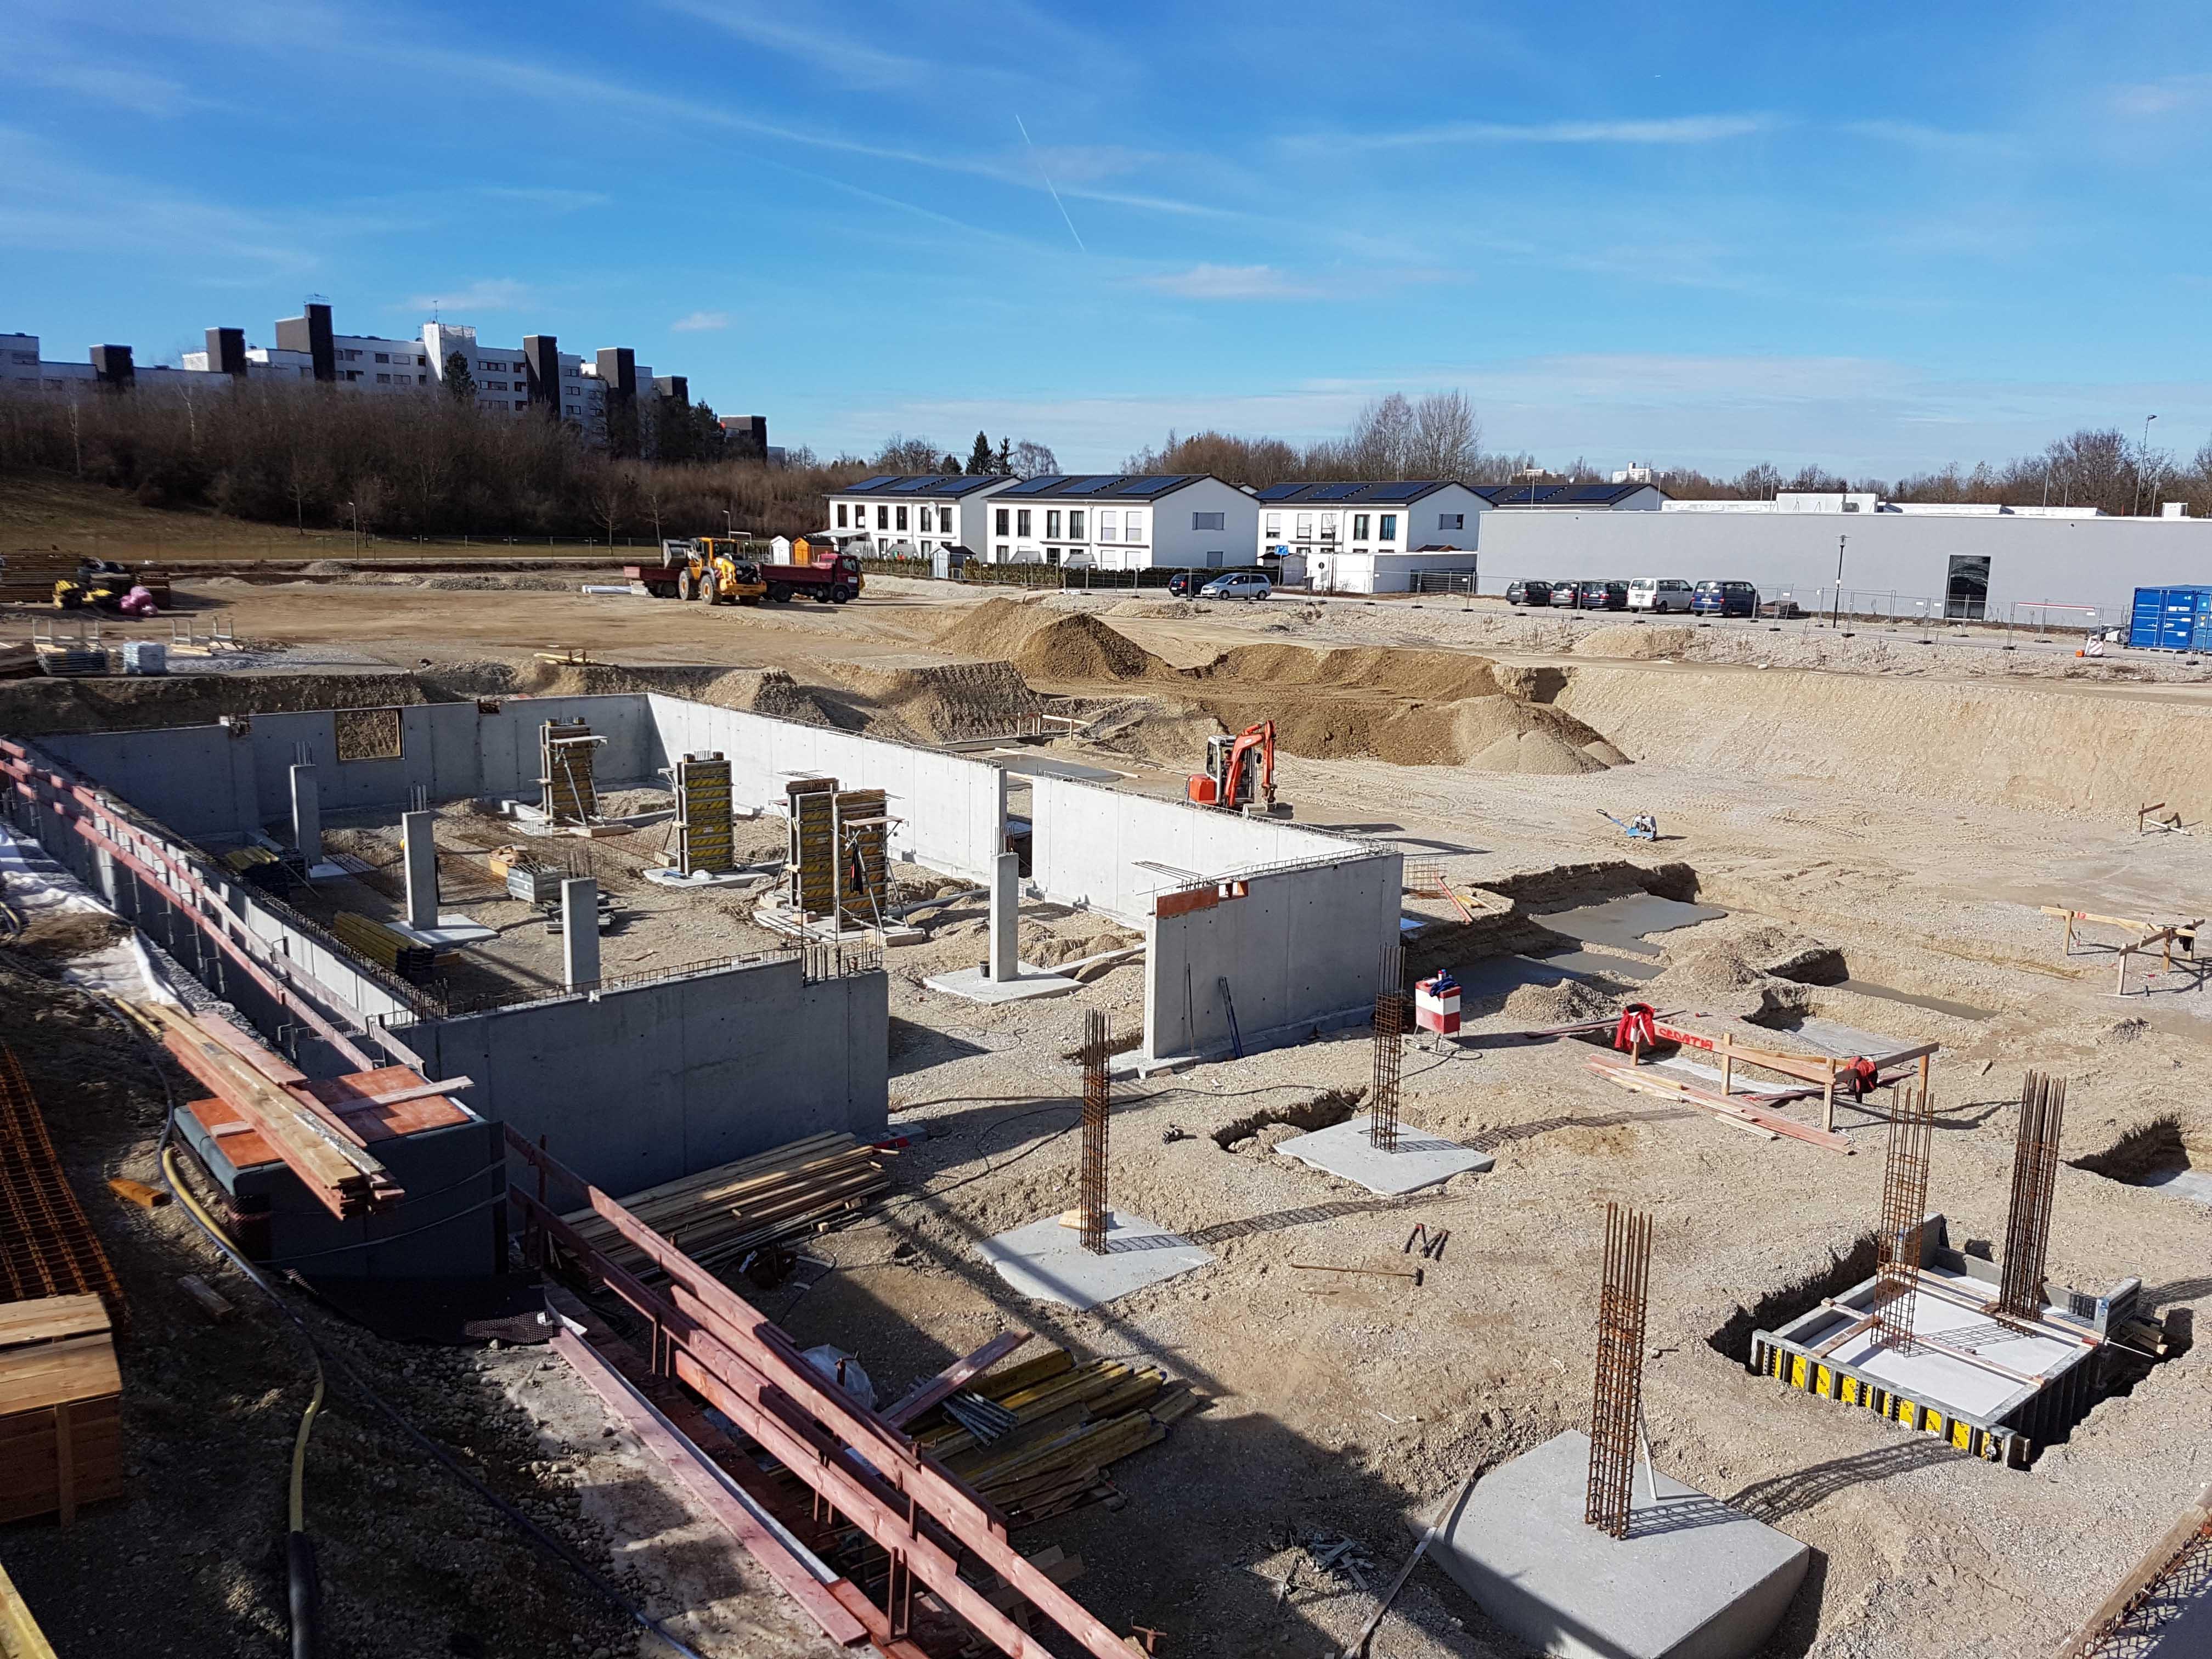 Unterhaching – Stumpfwiese – Baubeginn 2. Bauabschnitt